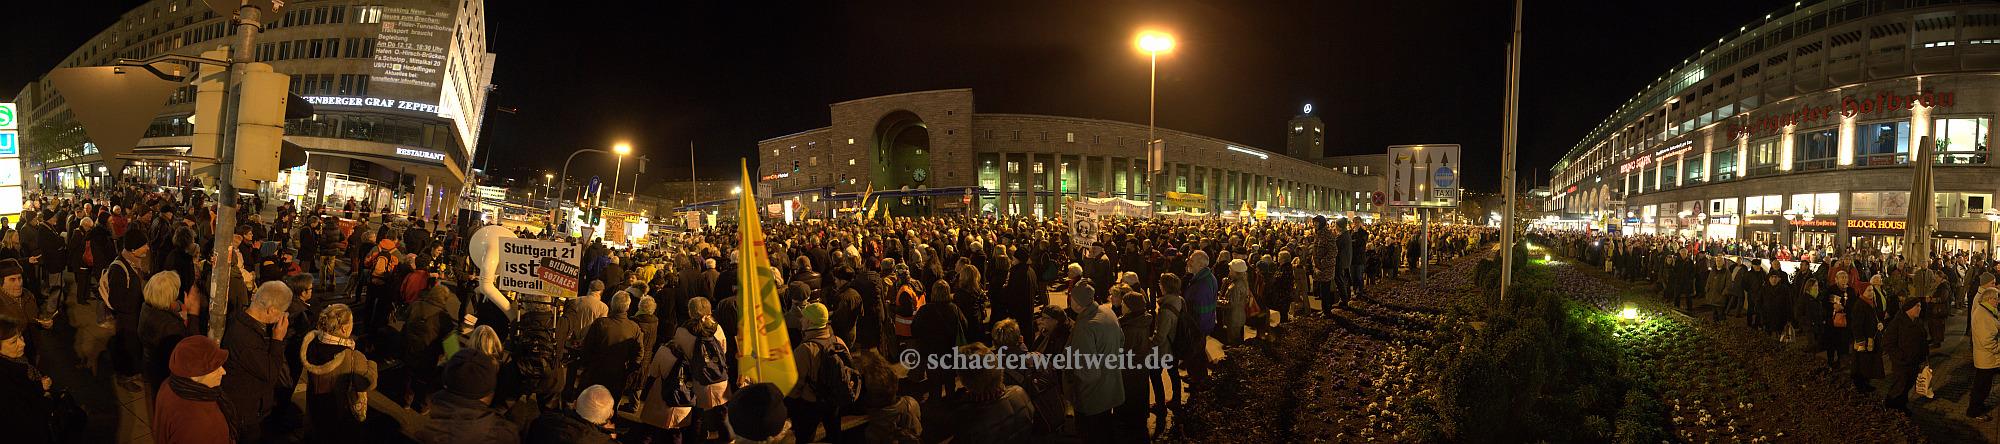 Arnulf-Klett-Platz Stuttgart - 09.12.13 ©schaeferweltweit.de